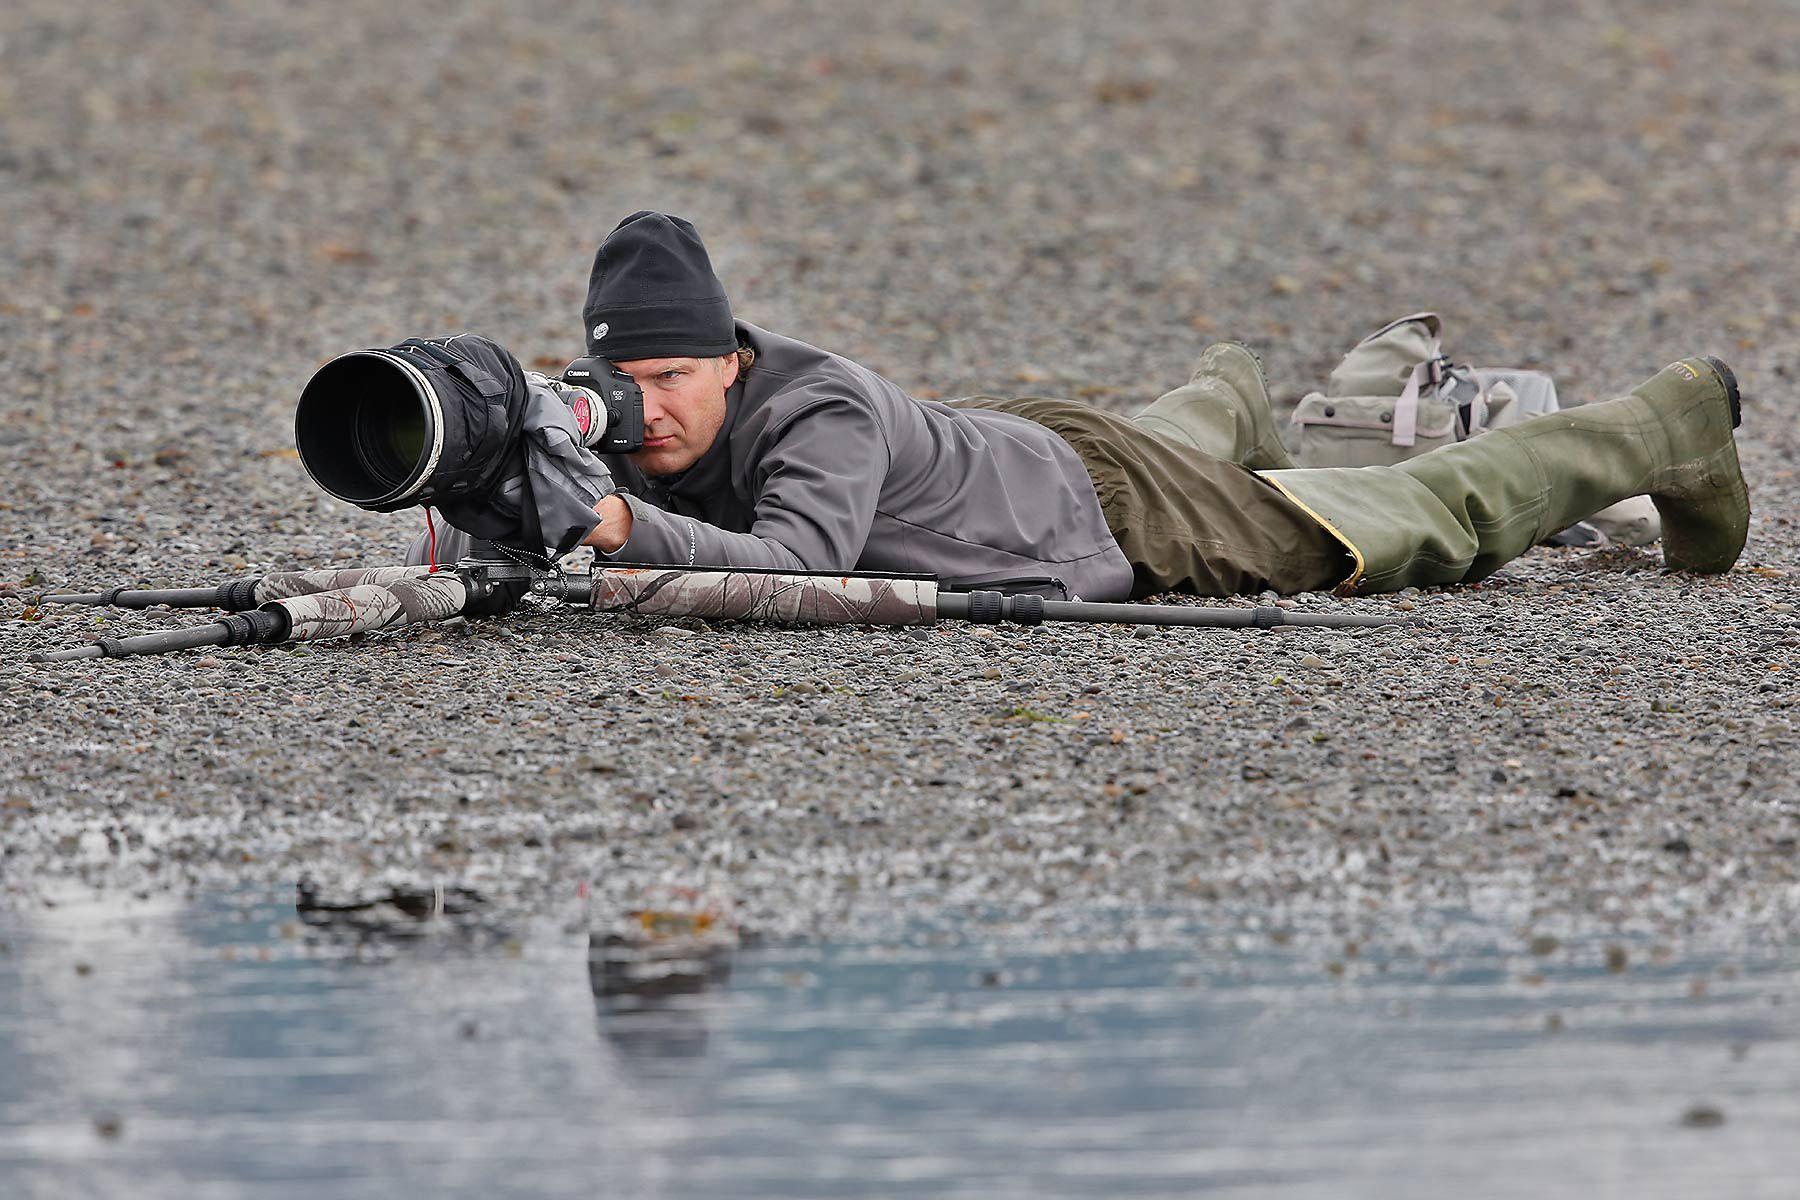 Clemens-Vanderwerf-in-action_A1C0139-Hallo-Bay,-Katmai-National-Park,-AK.jpg